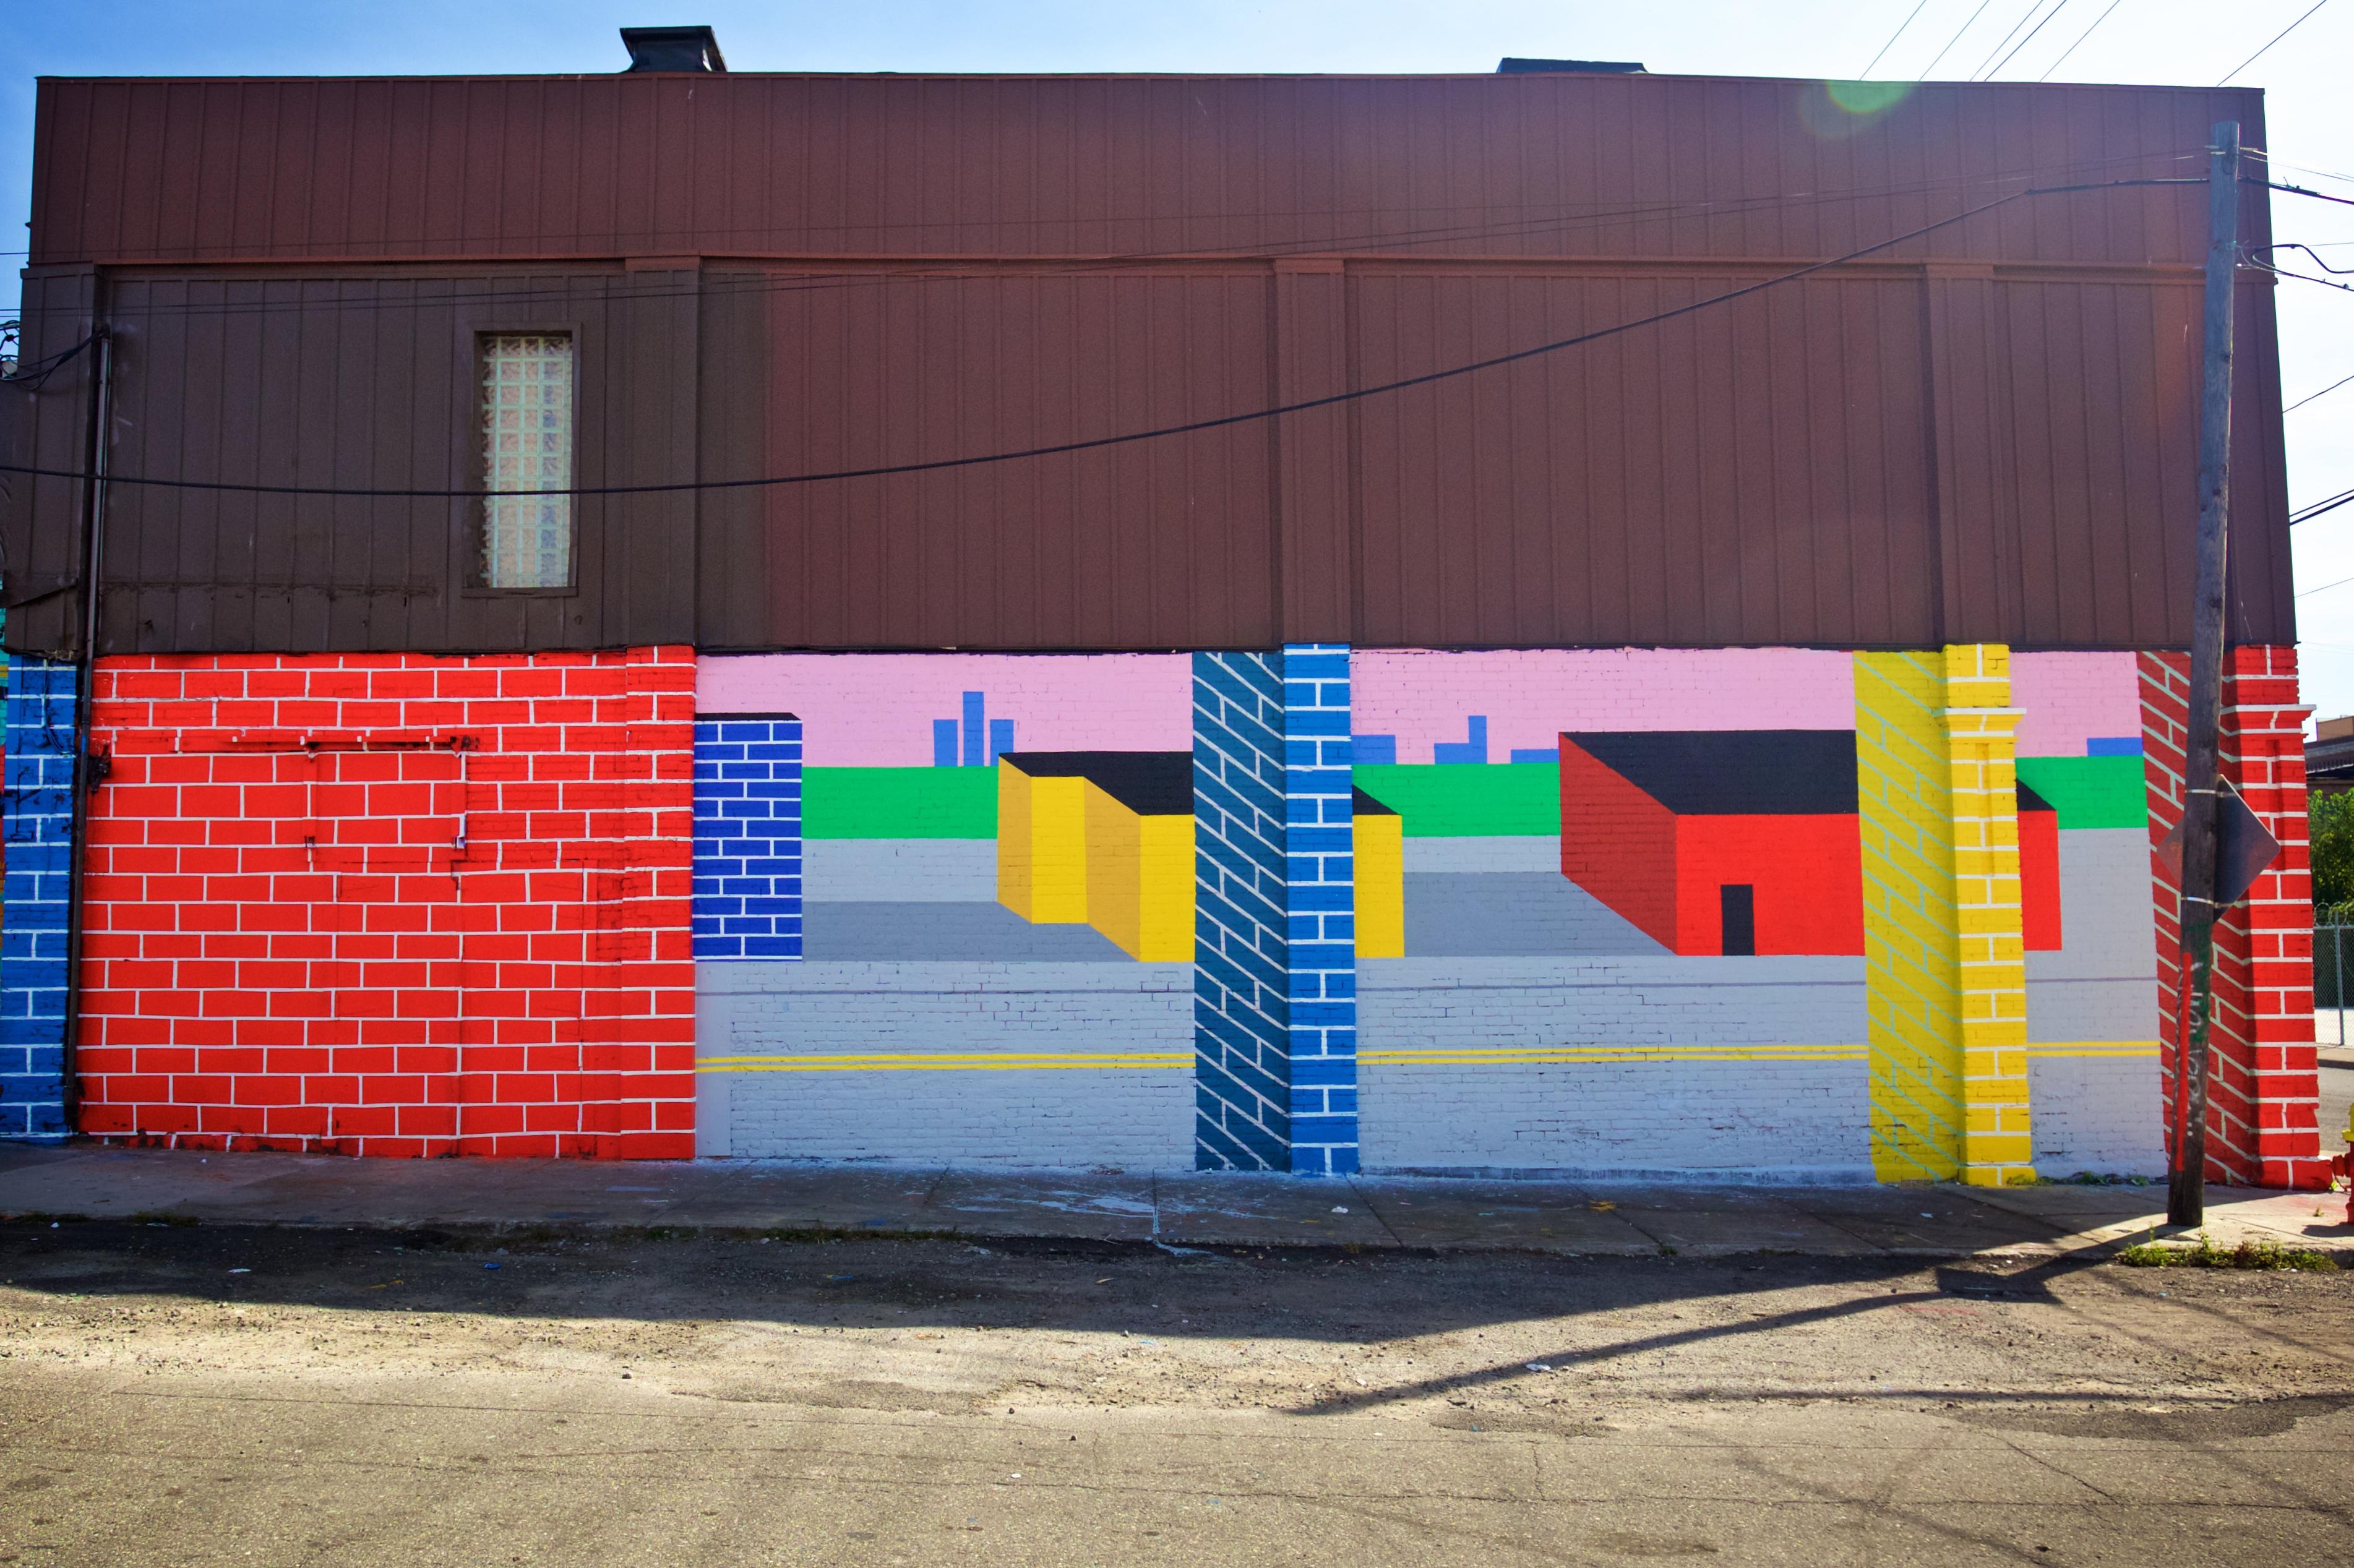 vaughn-taormina_muralsinthemarket_1xrun_finished-walls